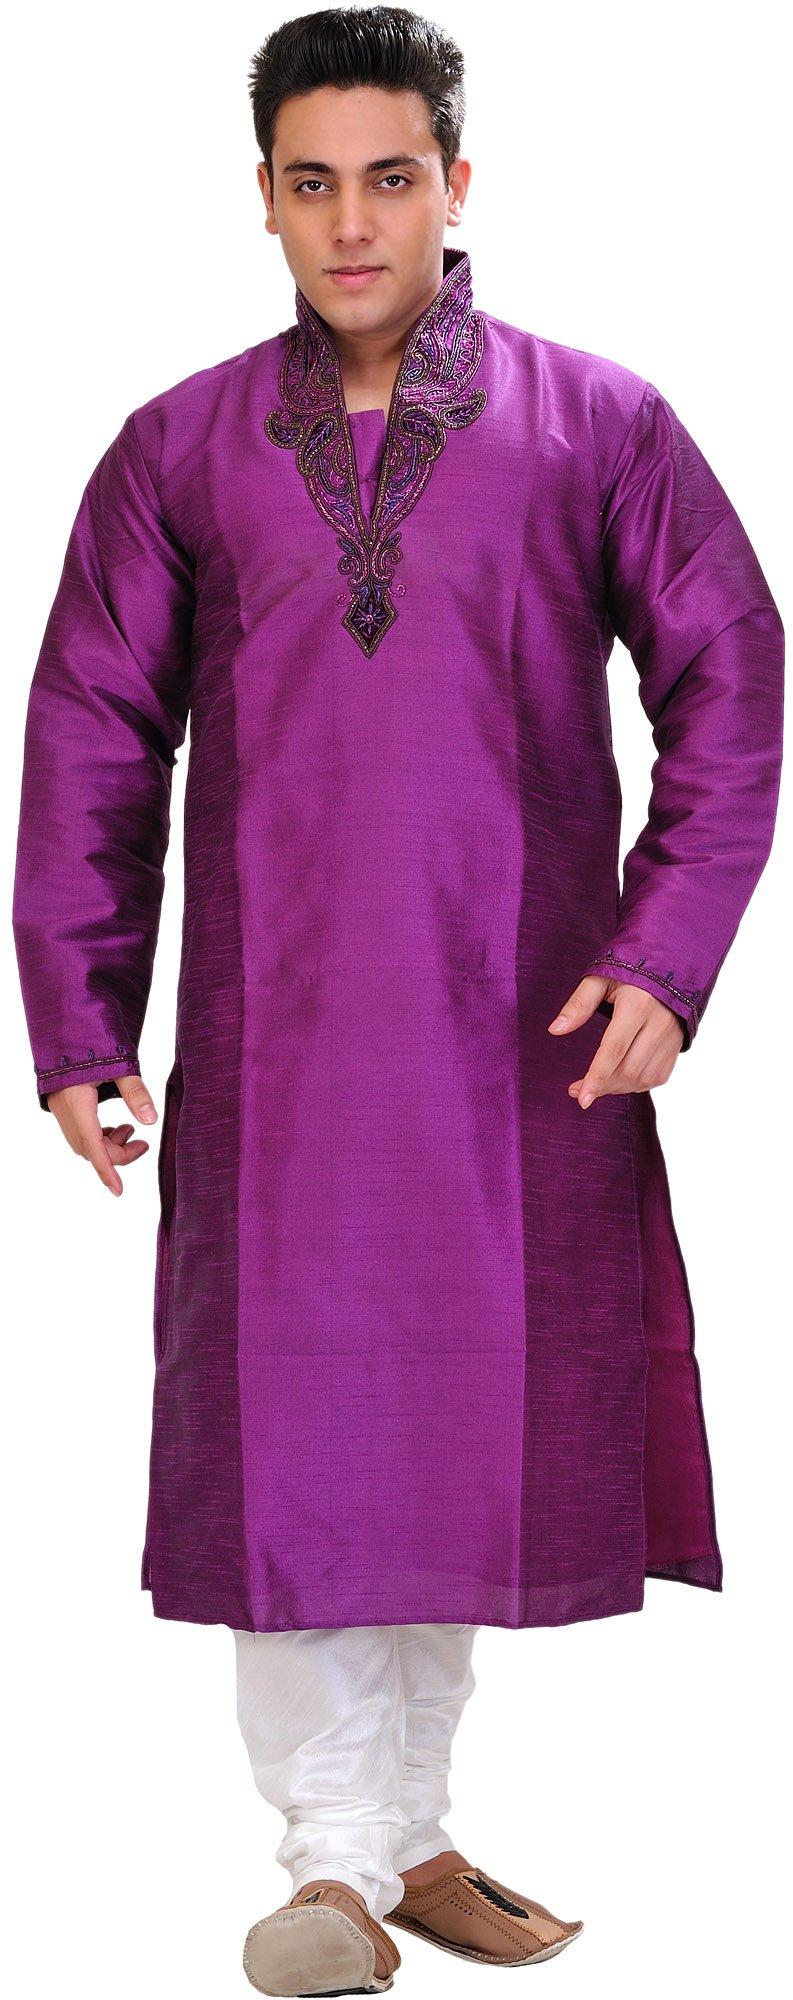 Exotic India Bright-Violet Wedding Kurta Pajam - Purple Size 40